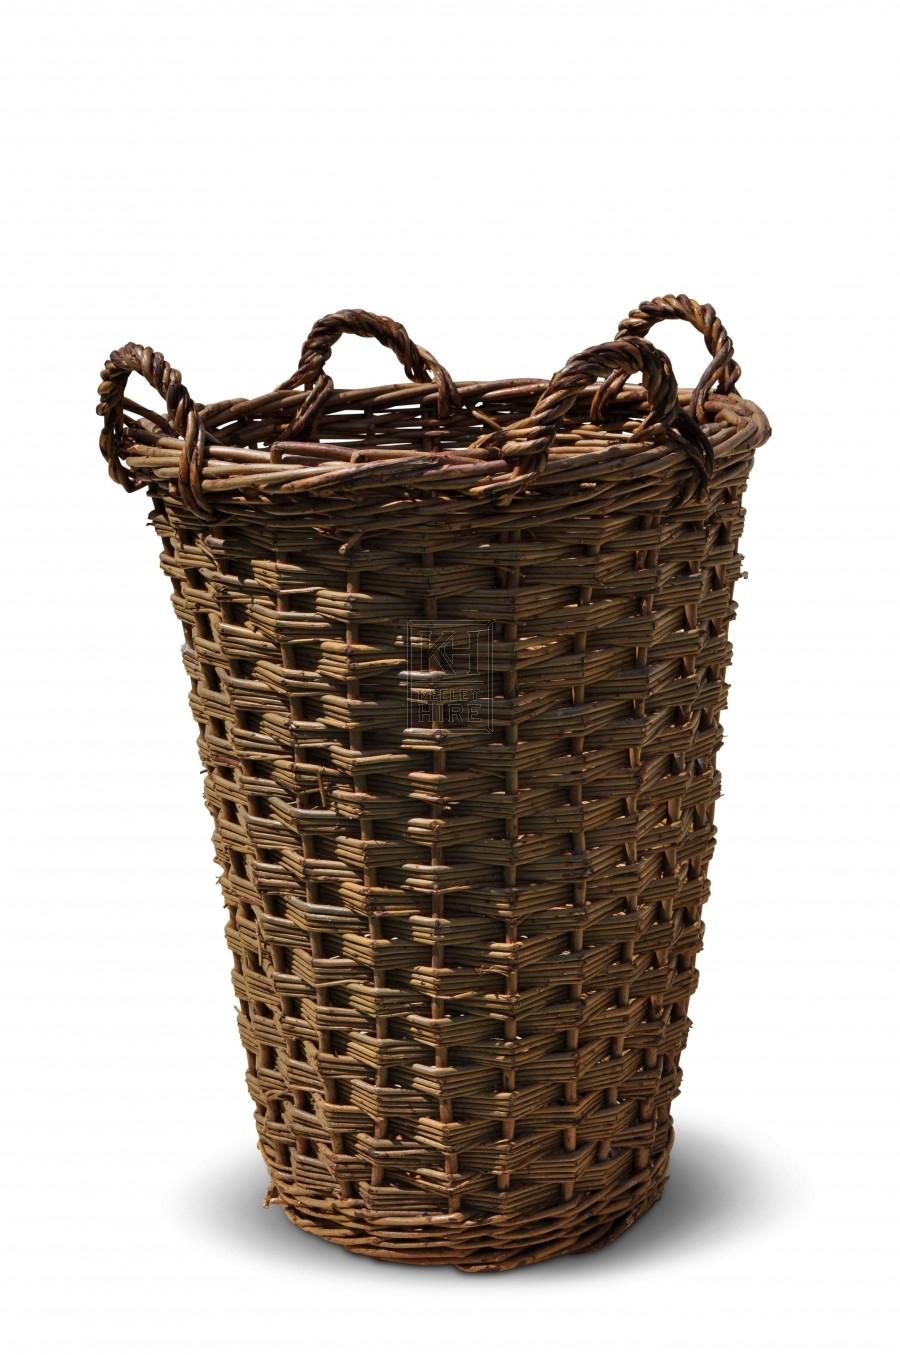 Tall Four Handled Baskets